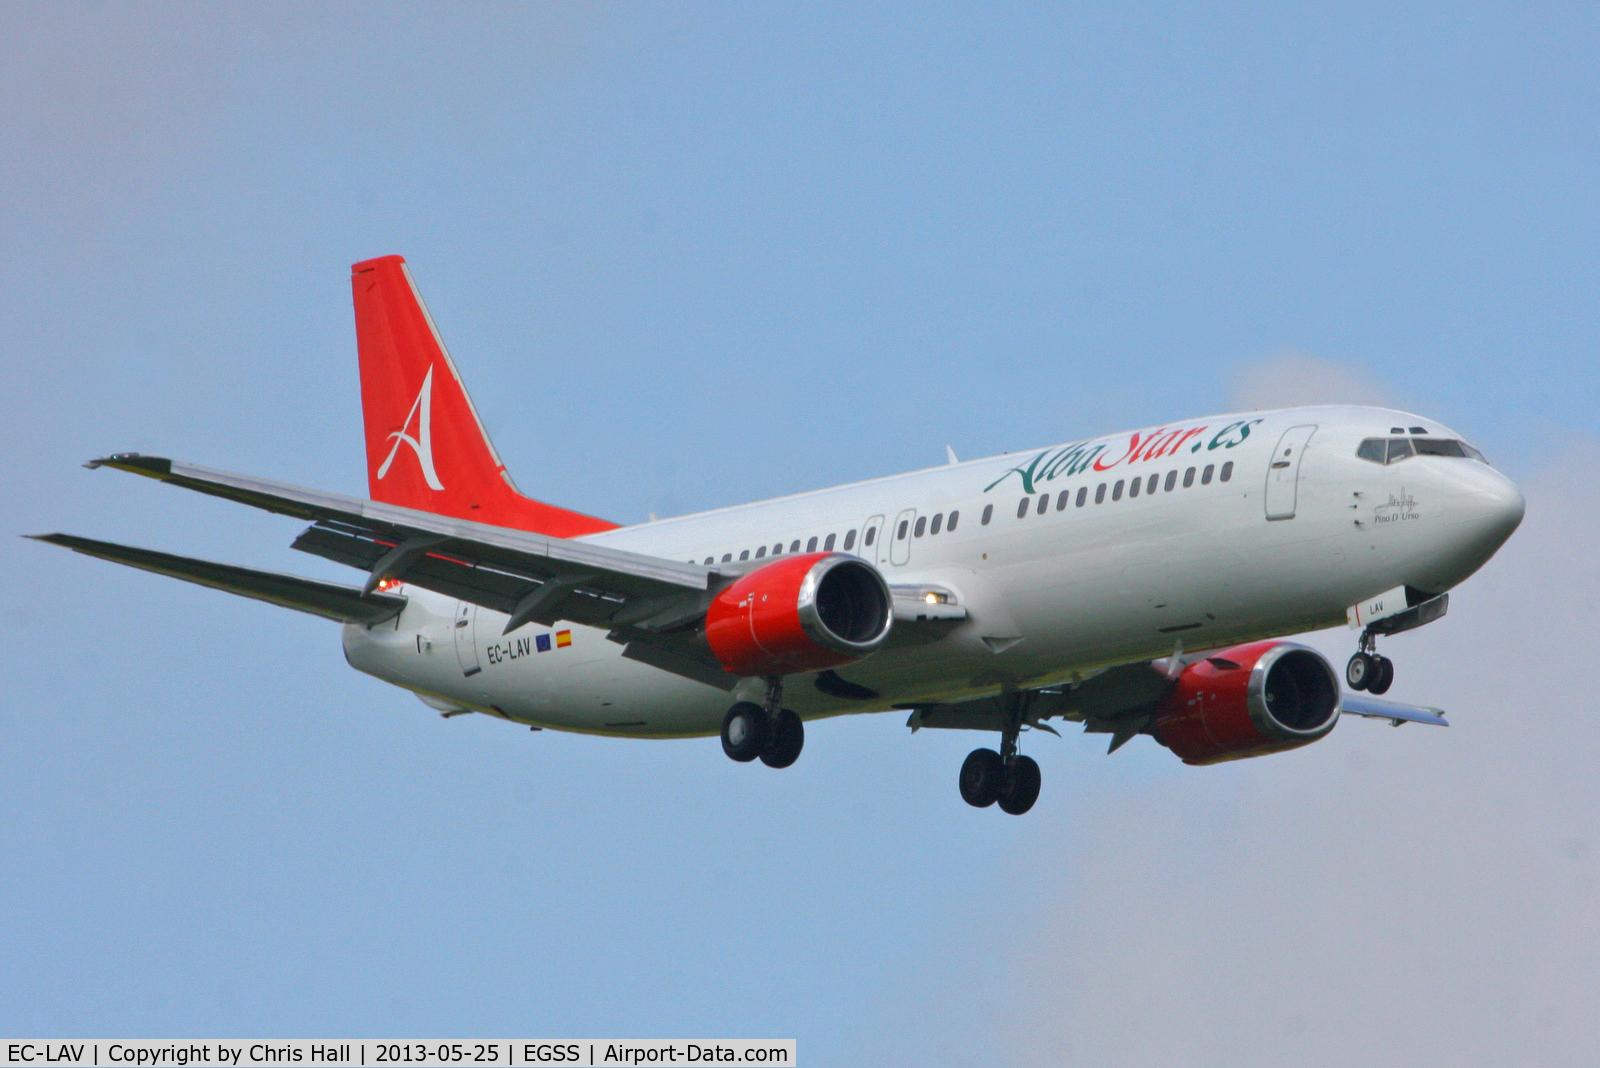 EC-LAV, 1989 Boeing 737-408 C/N 24352, Alba Star